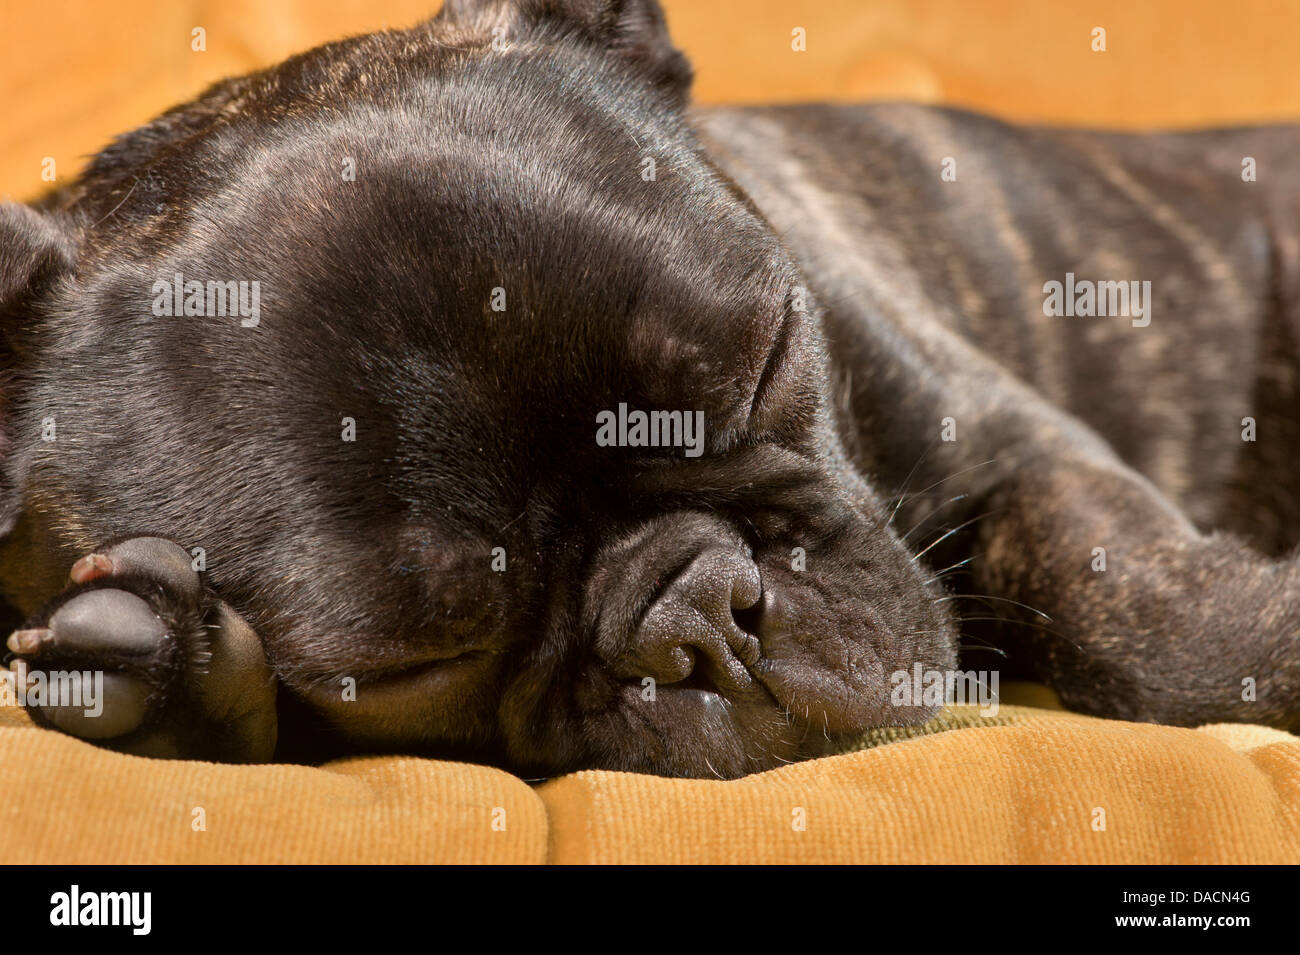 Sleeping French Bulldog puppy Stock Photo